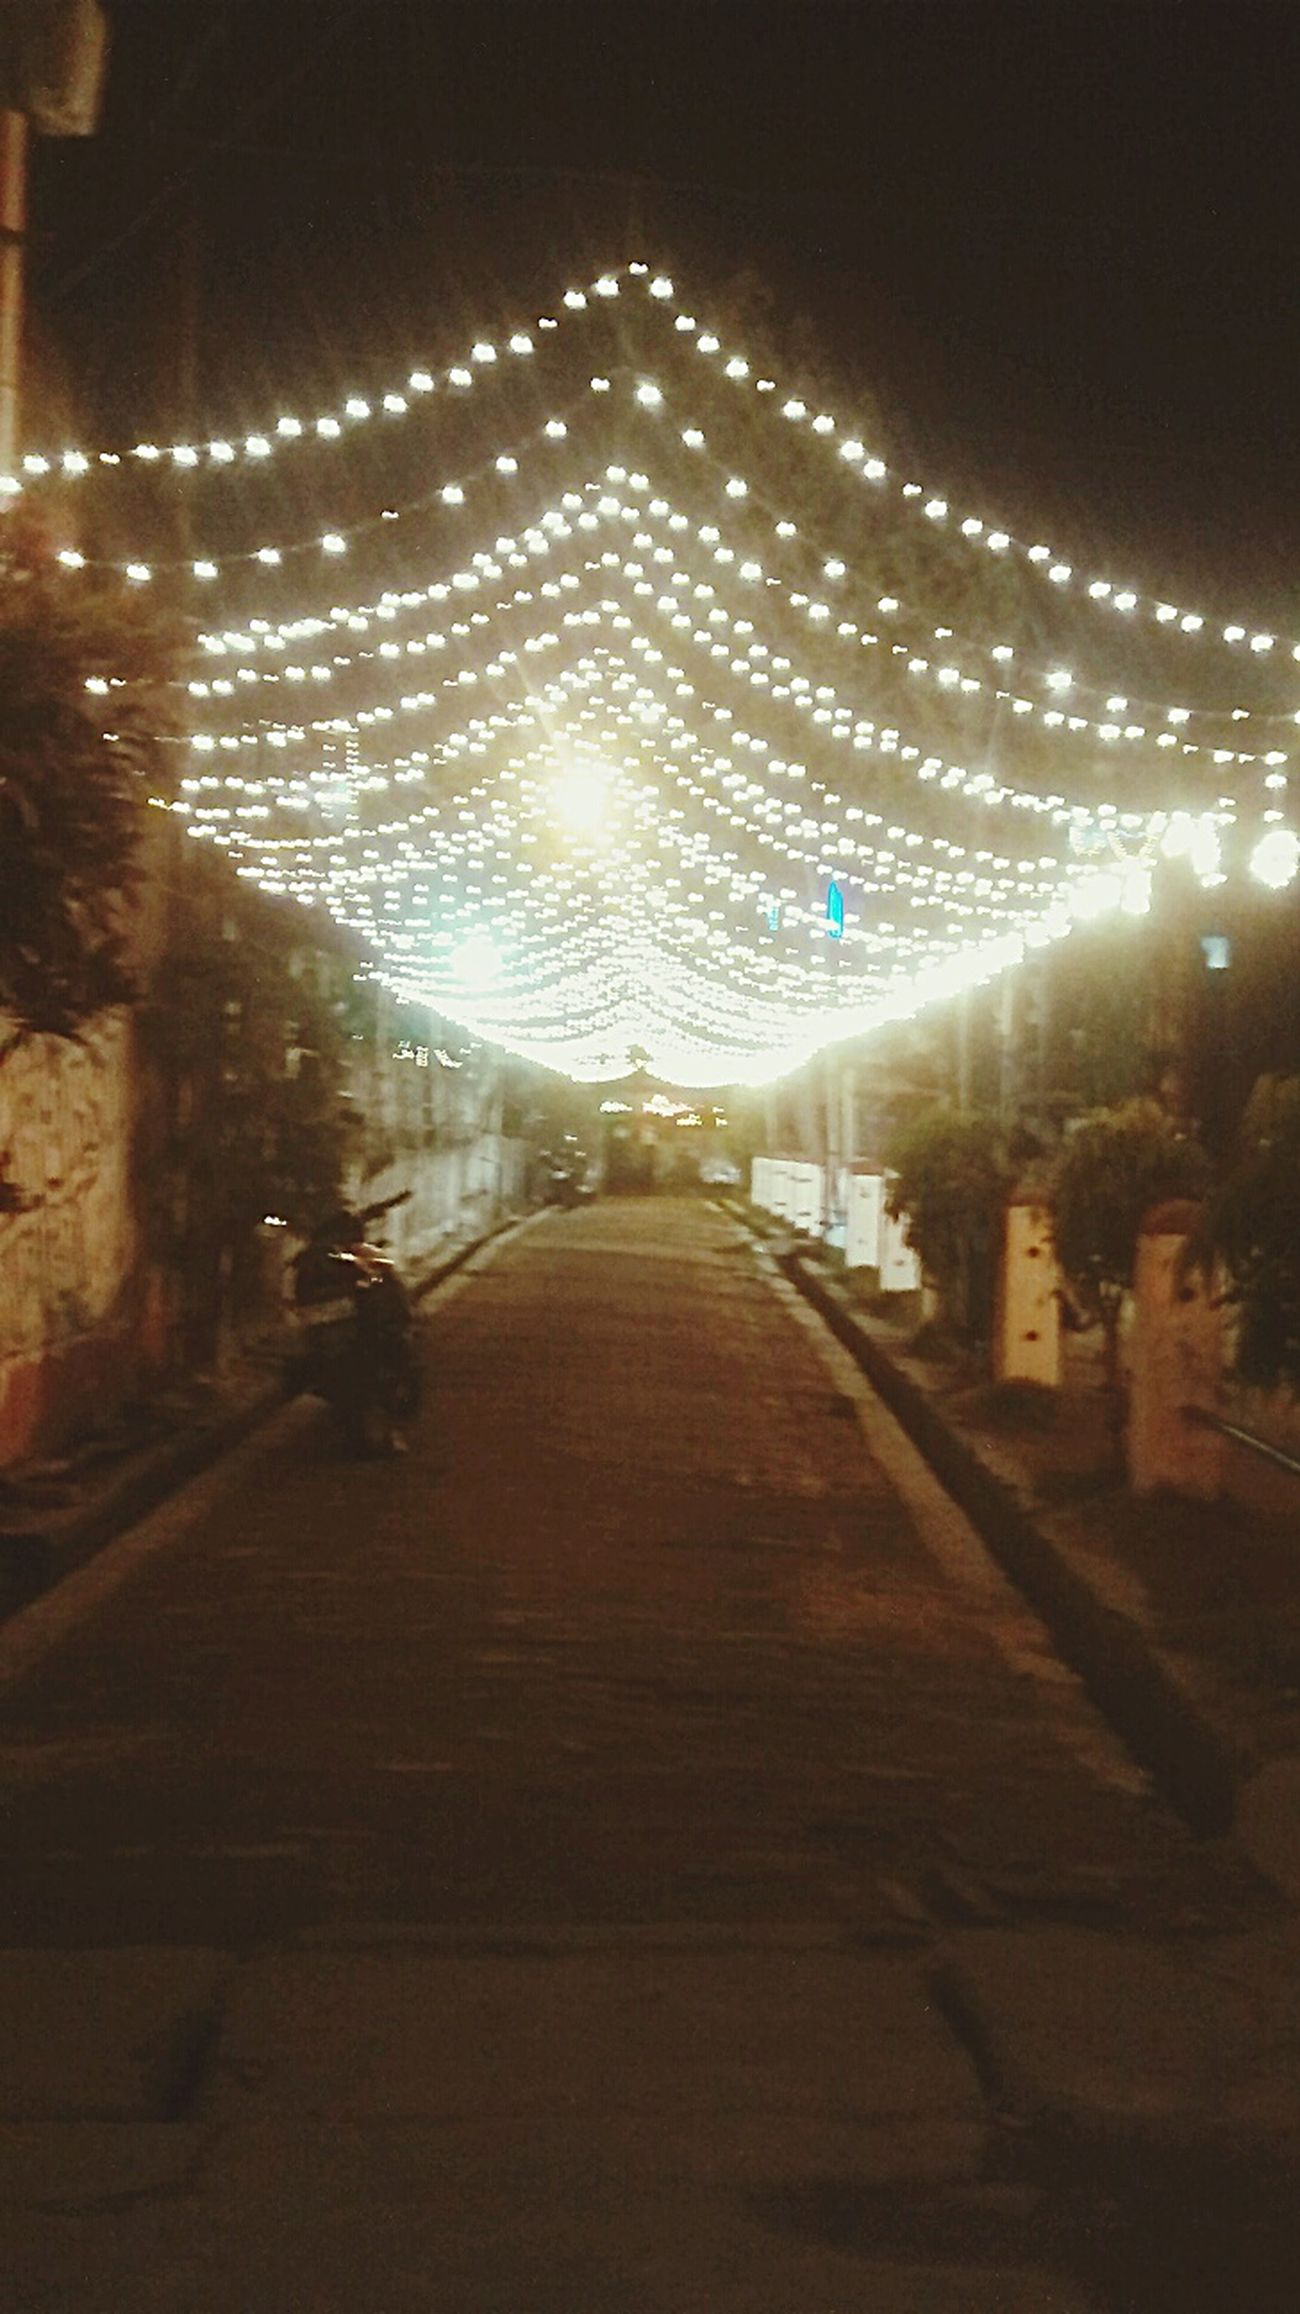 How You Celebrate Holidays Diwali season begins.! Lotsoflights Festivaloflights Festivalbegins Diwalicelebrations next few days its going to be all about Diwali Happy Diwali